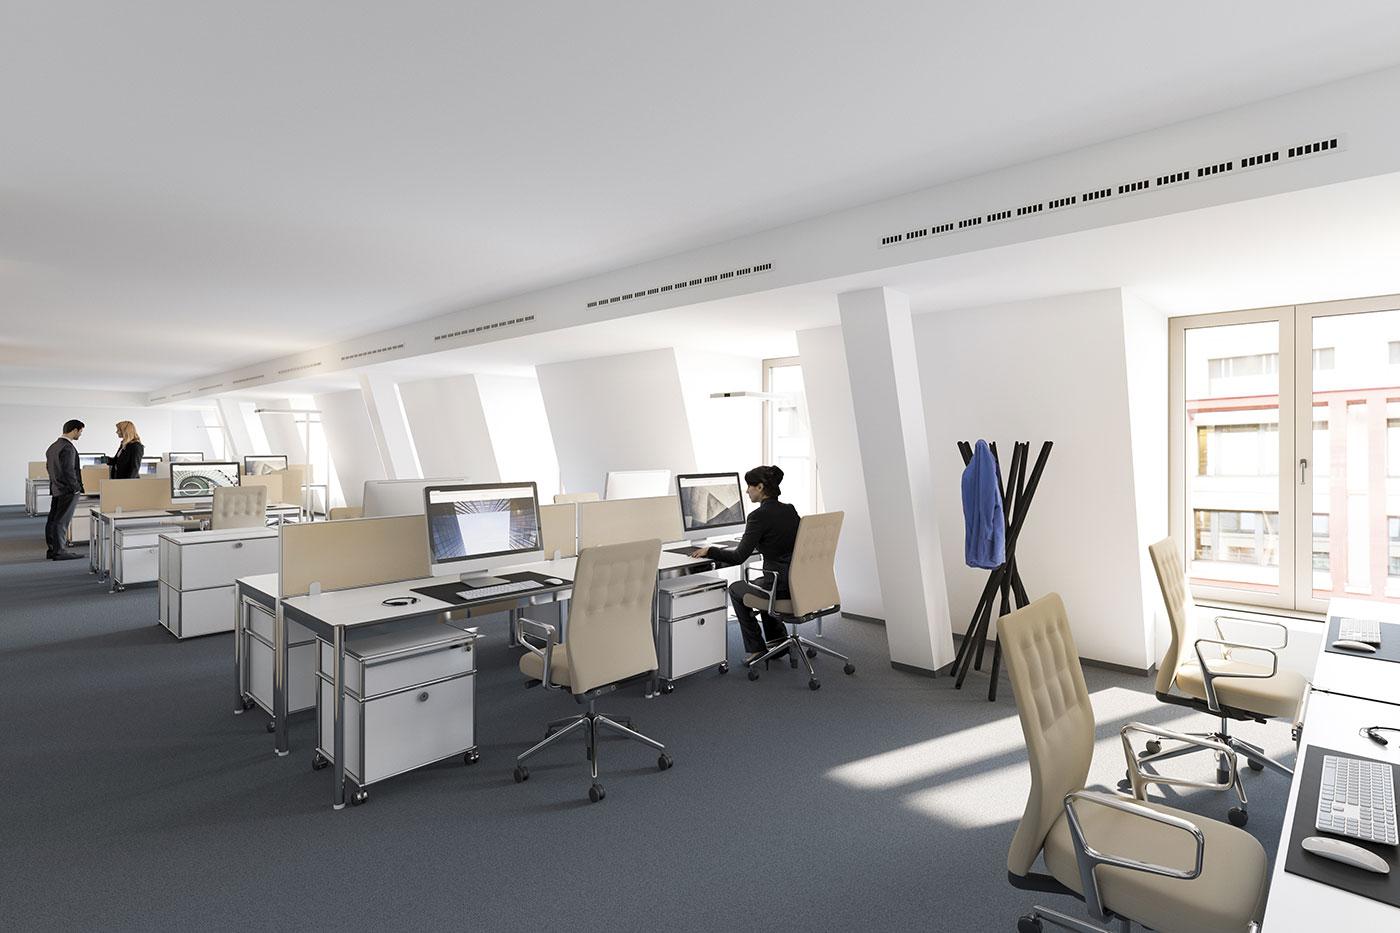 Moderne b rokonzepte grundriss neuesten for Kare design frankfurt